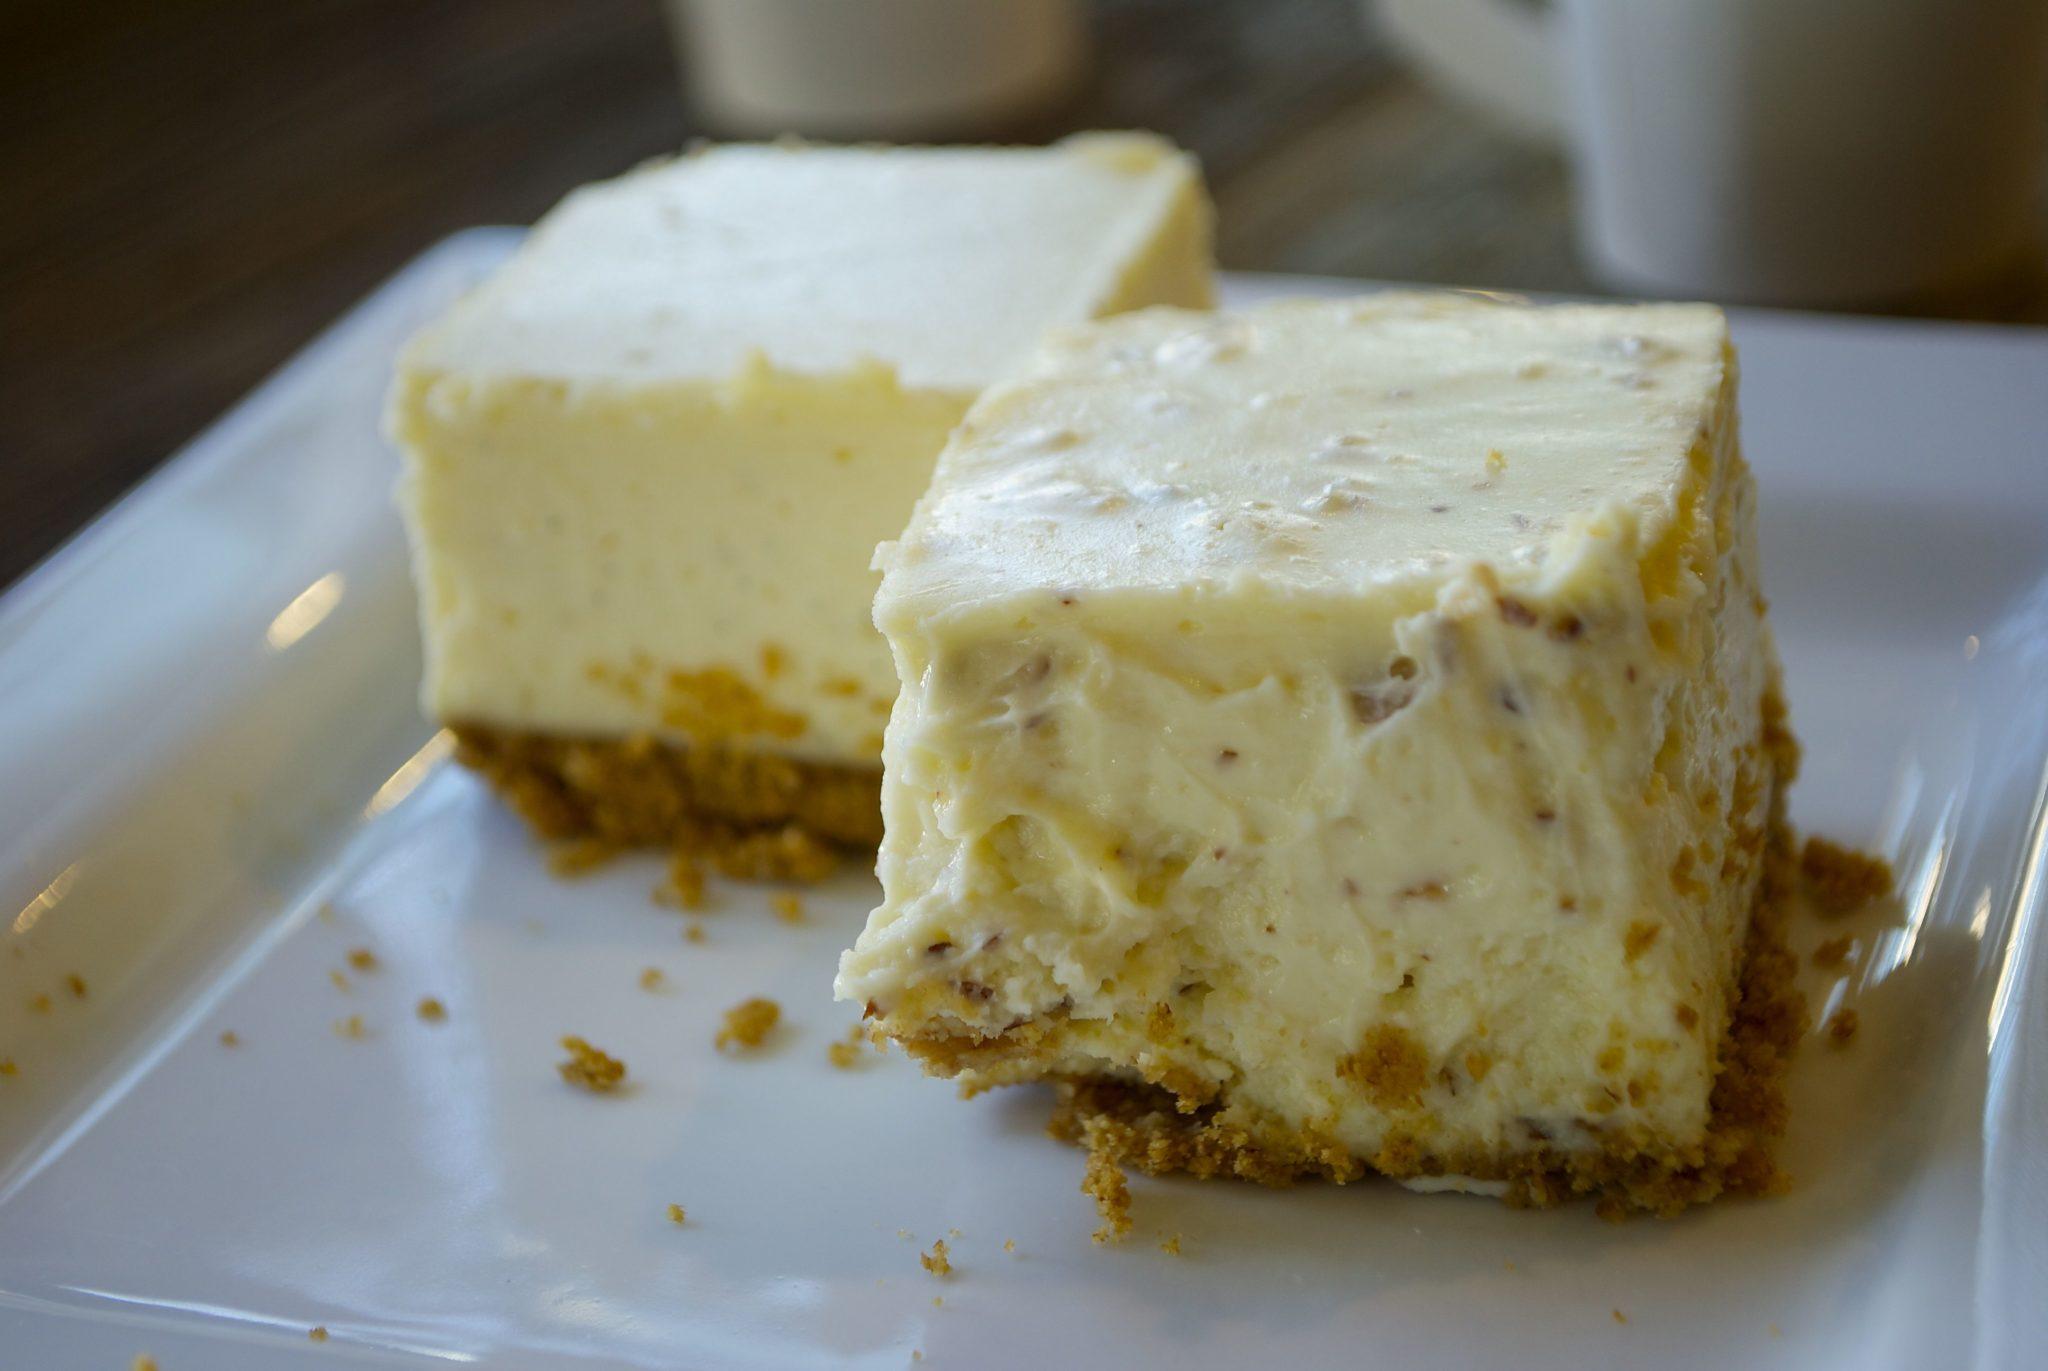 Tasting Plates YVR: Trees Organic cheesecake